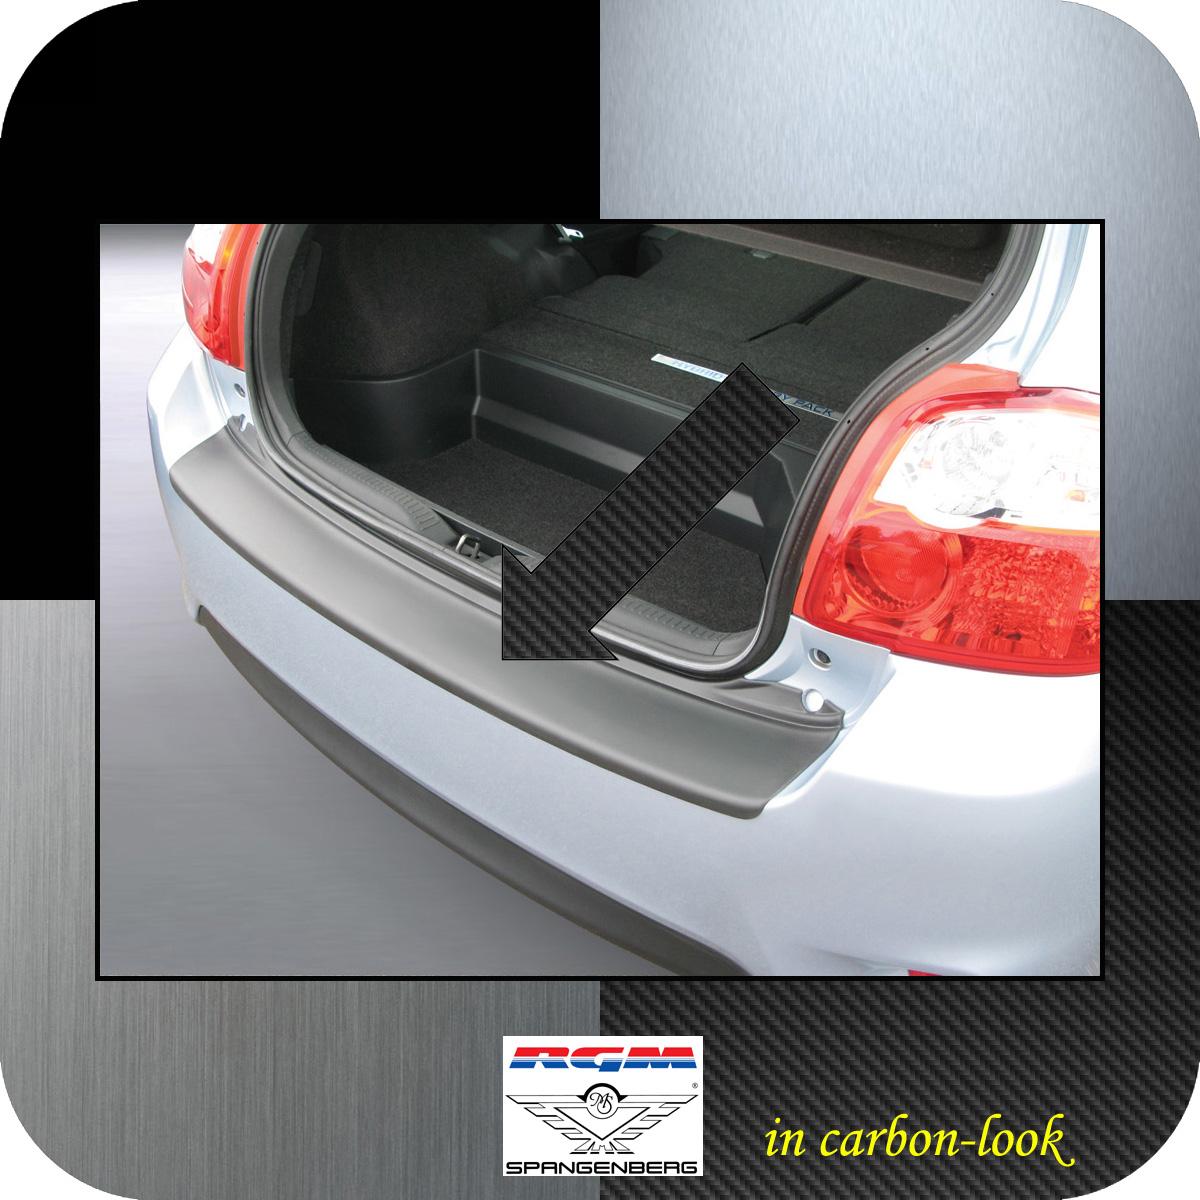 Ladekantenschutz Carbon-Look Toyota Auris I Schrägheck ab Mopf 2010-2012 3509515